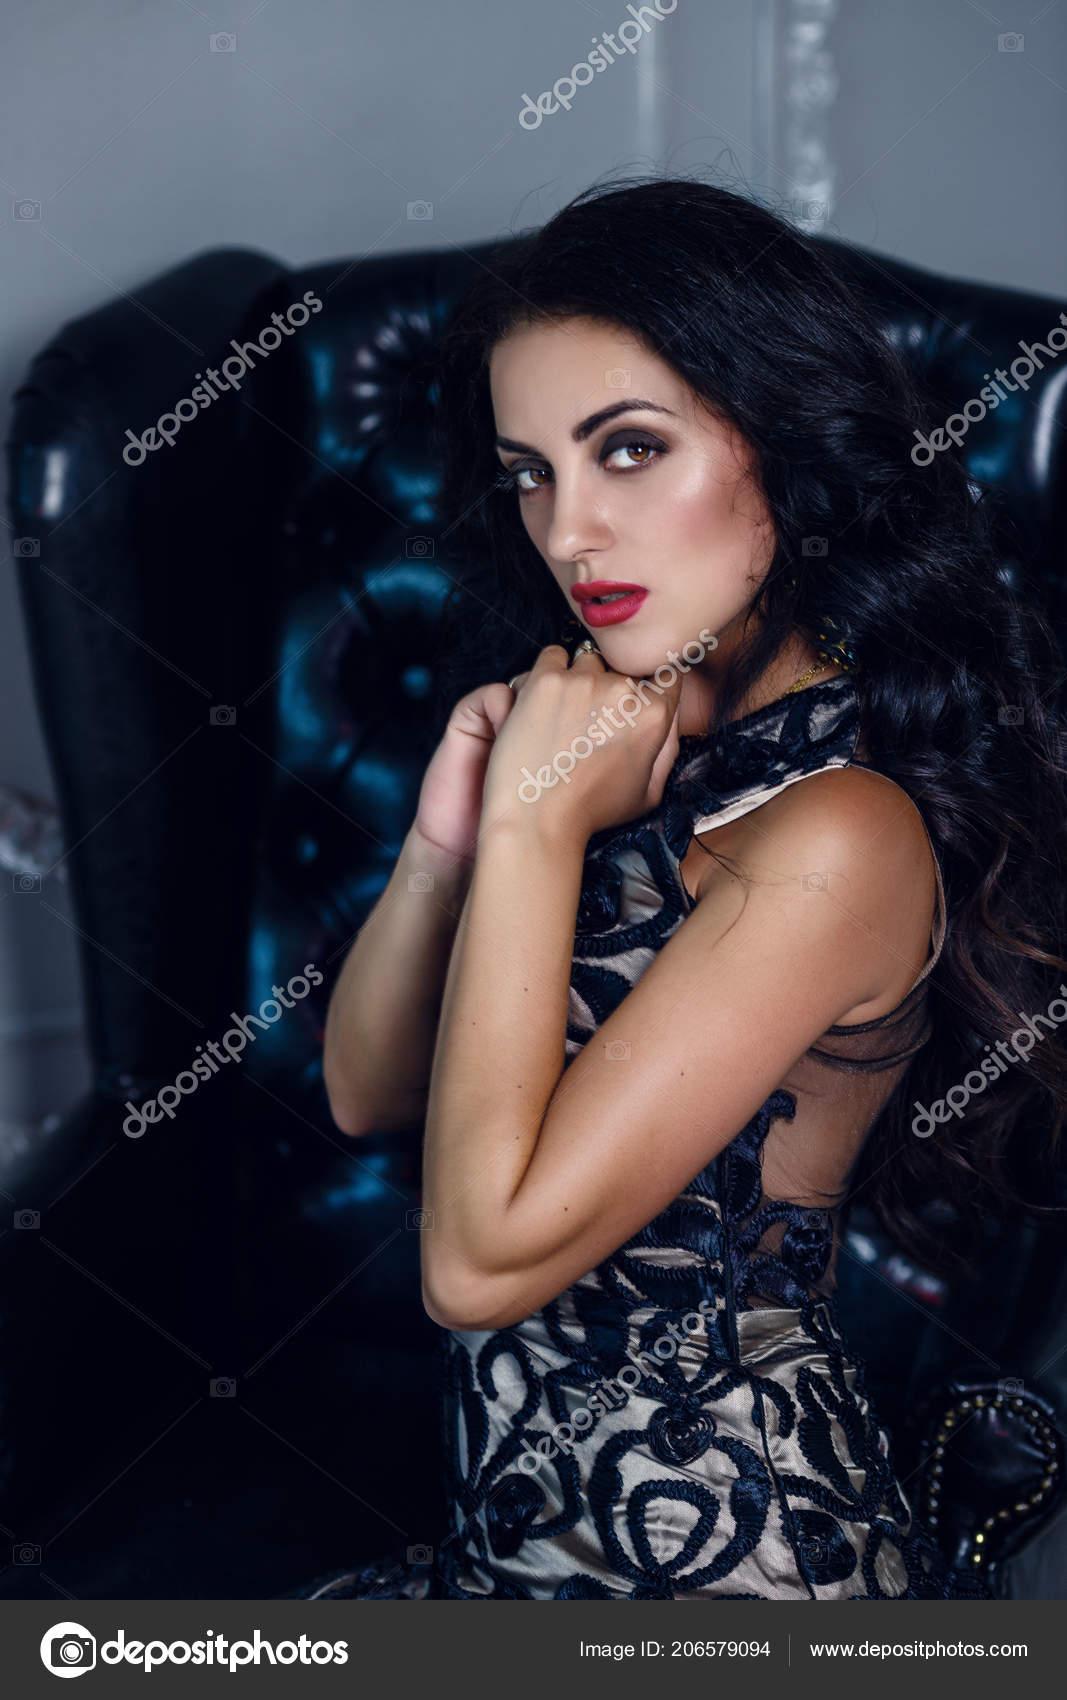 82ecc6566680 Elegante Mujer Morena Sexy Vestido Moda Posando Modelo Chica ...